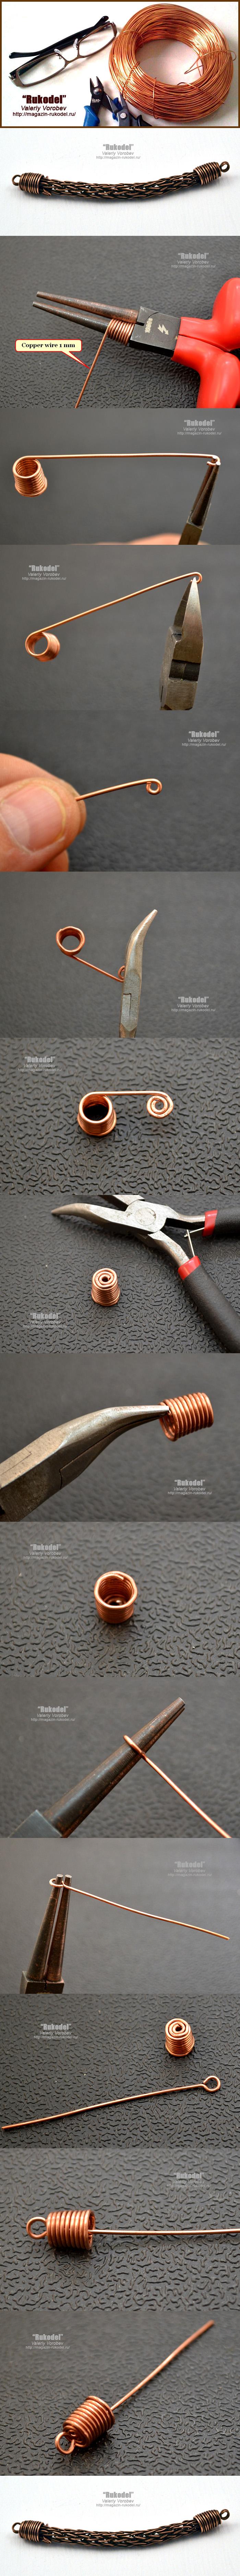 Концевики для бижутерии своими руками.